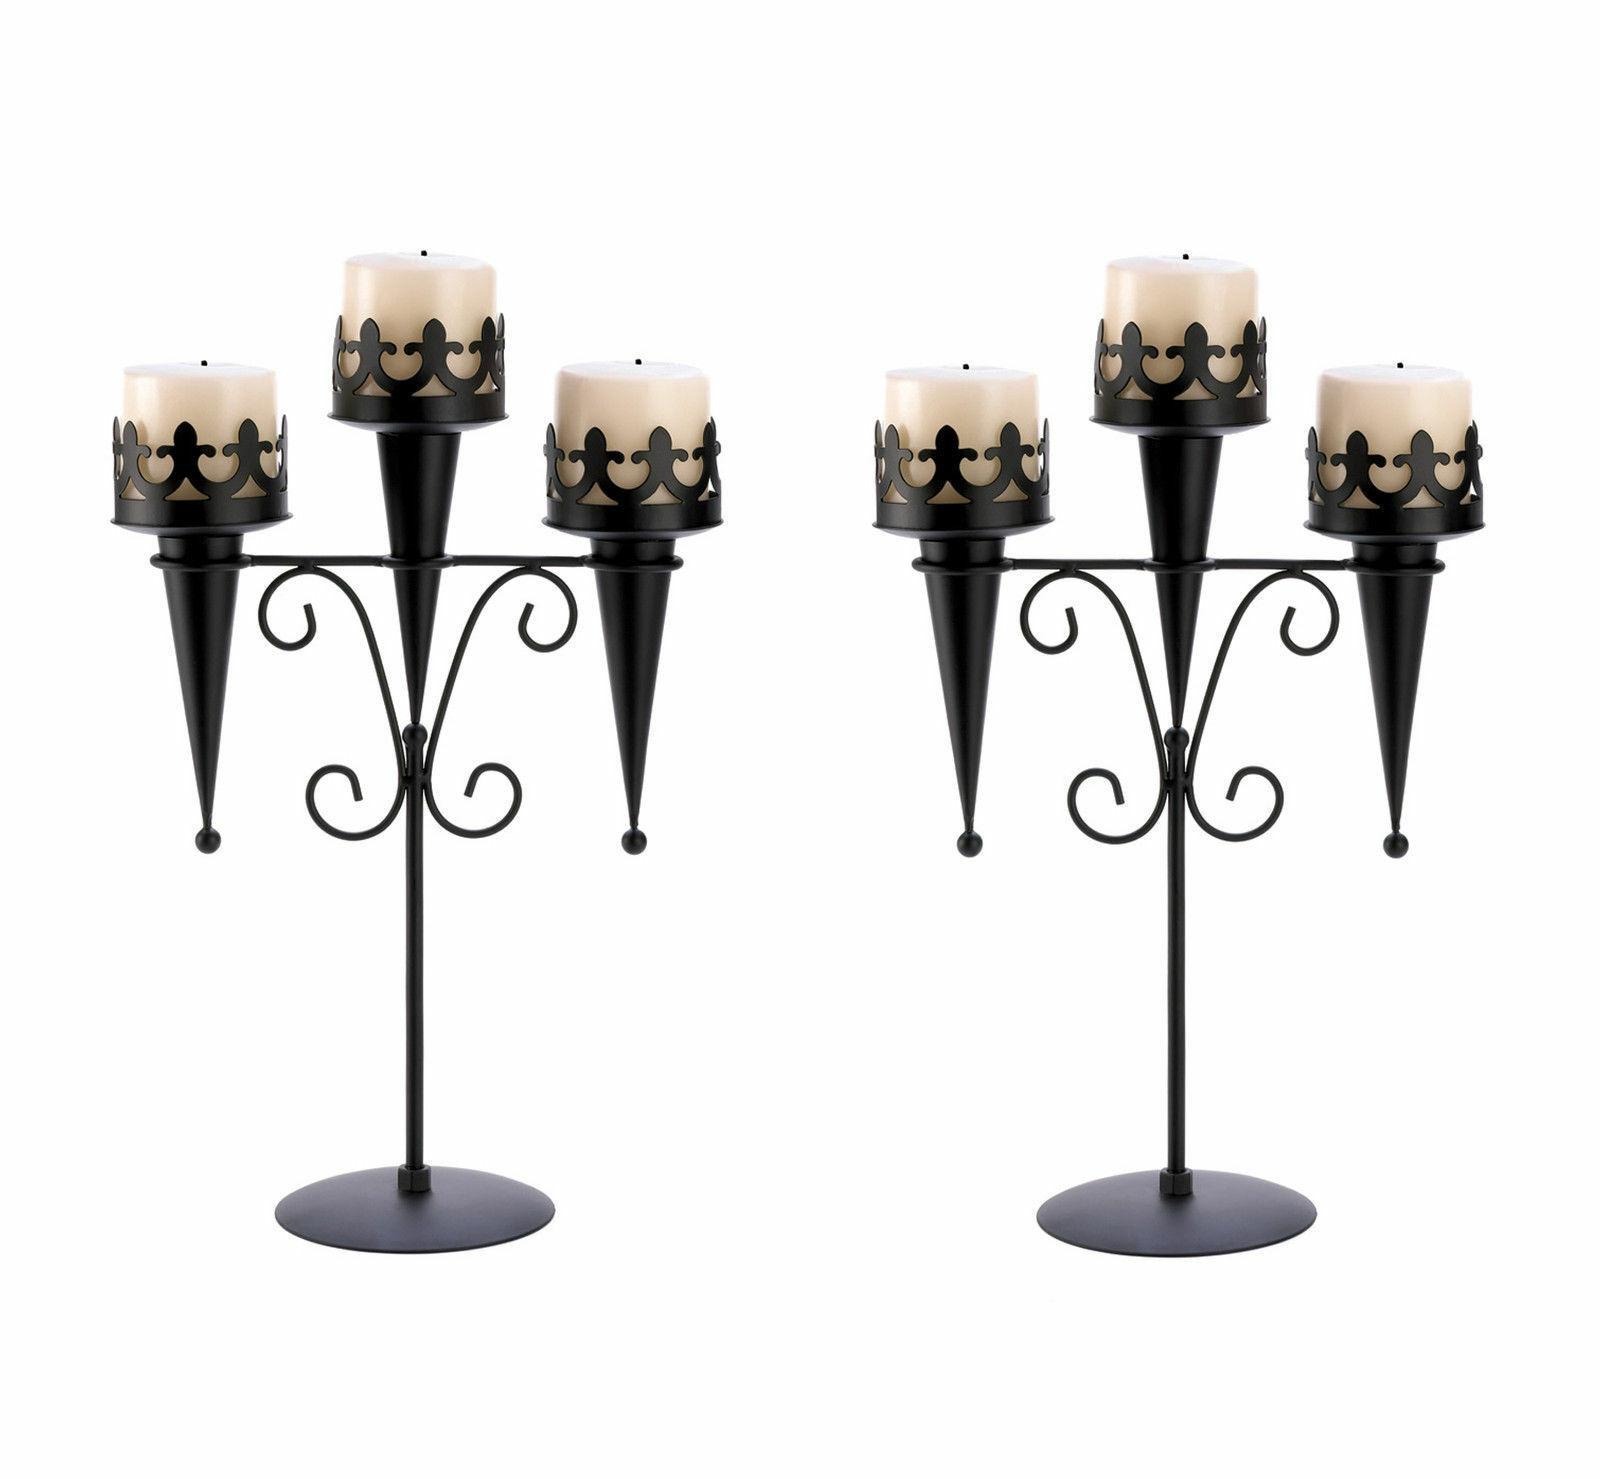 2 Medieval Gothic Triple Pillar Candle Holder Stand Set Pair Black Iron SL 14114